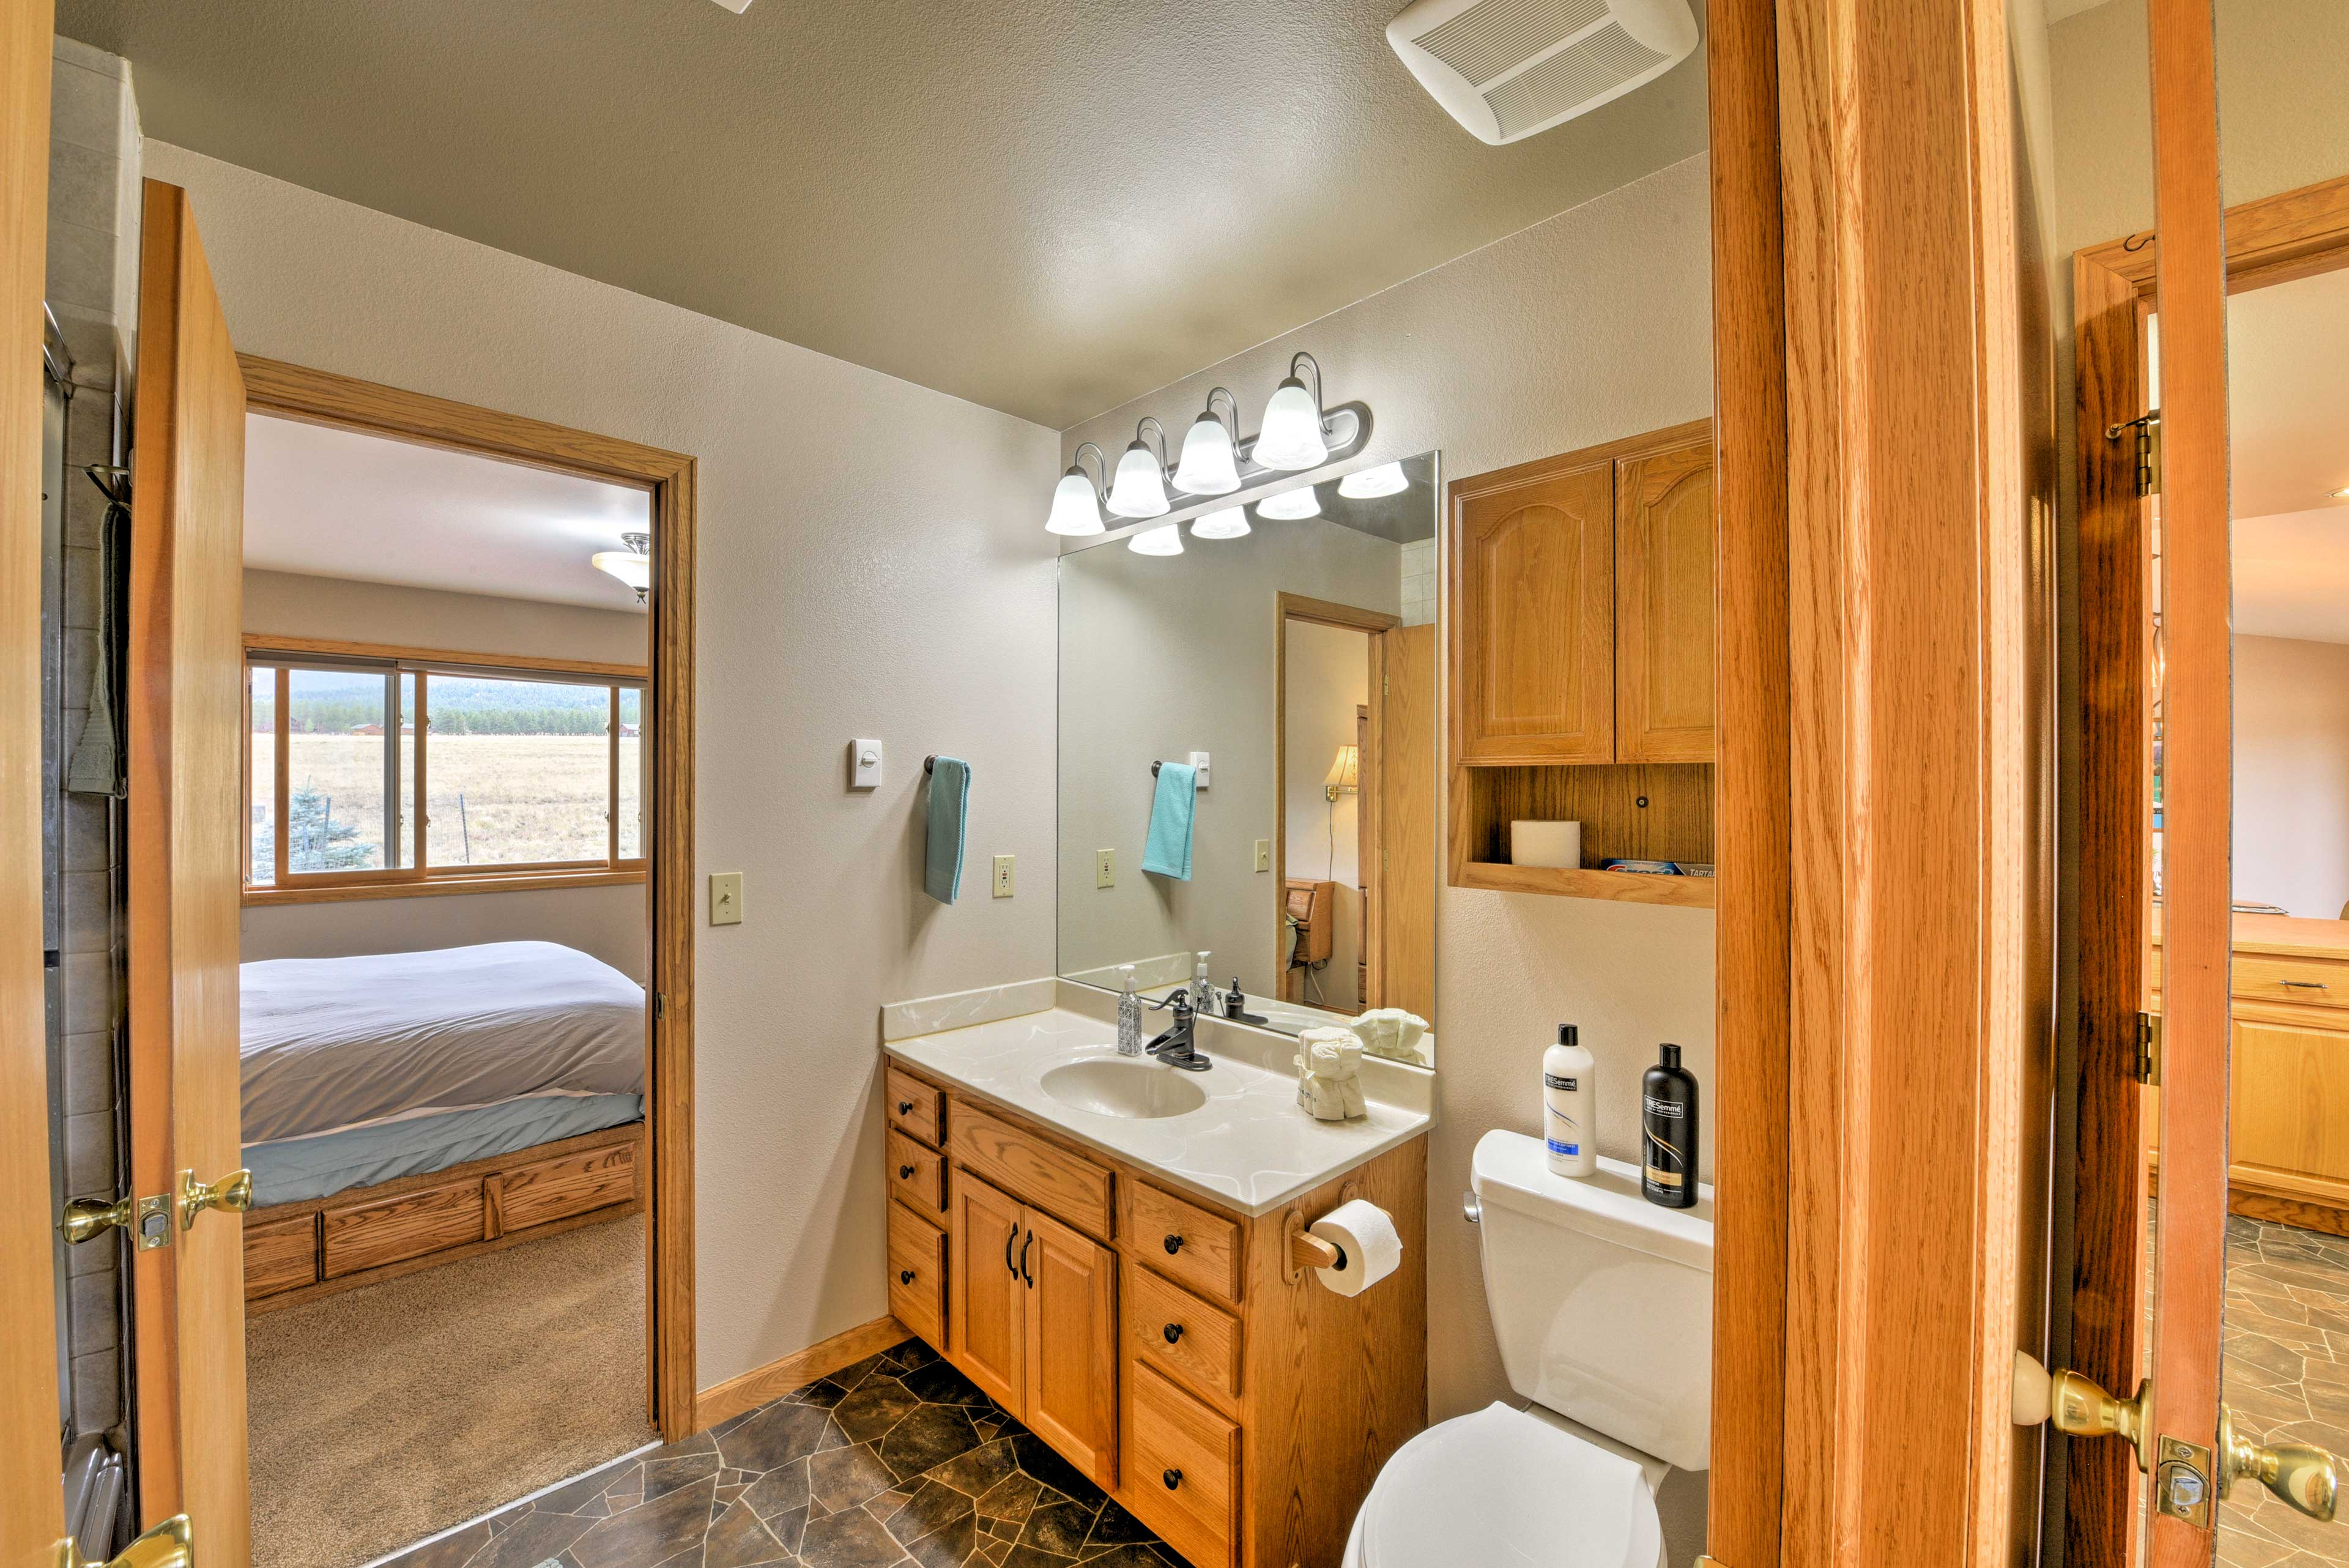 Before bed, wash up in this full en-site bathroom.